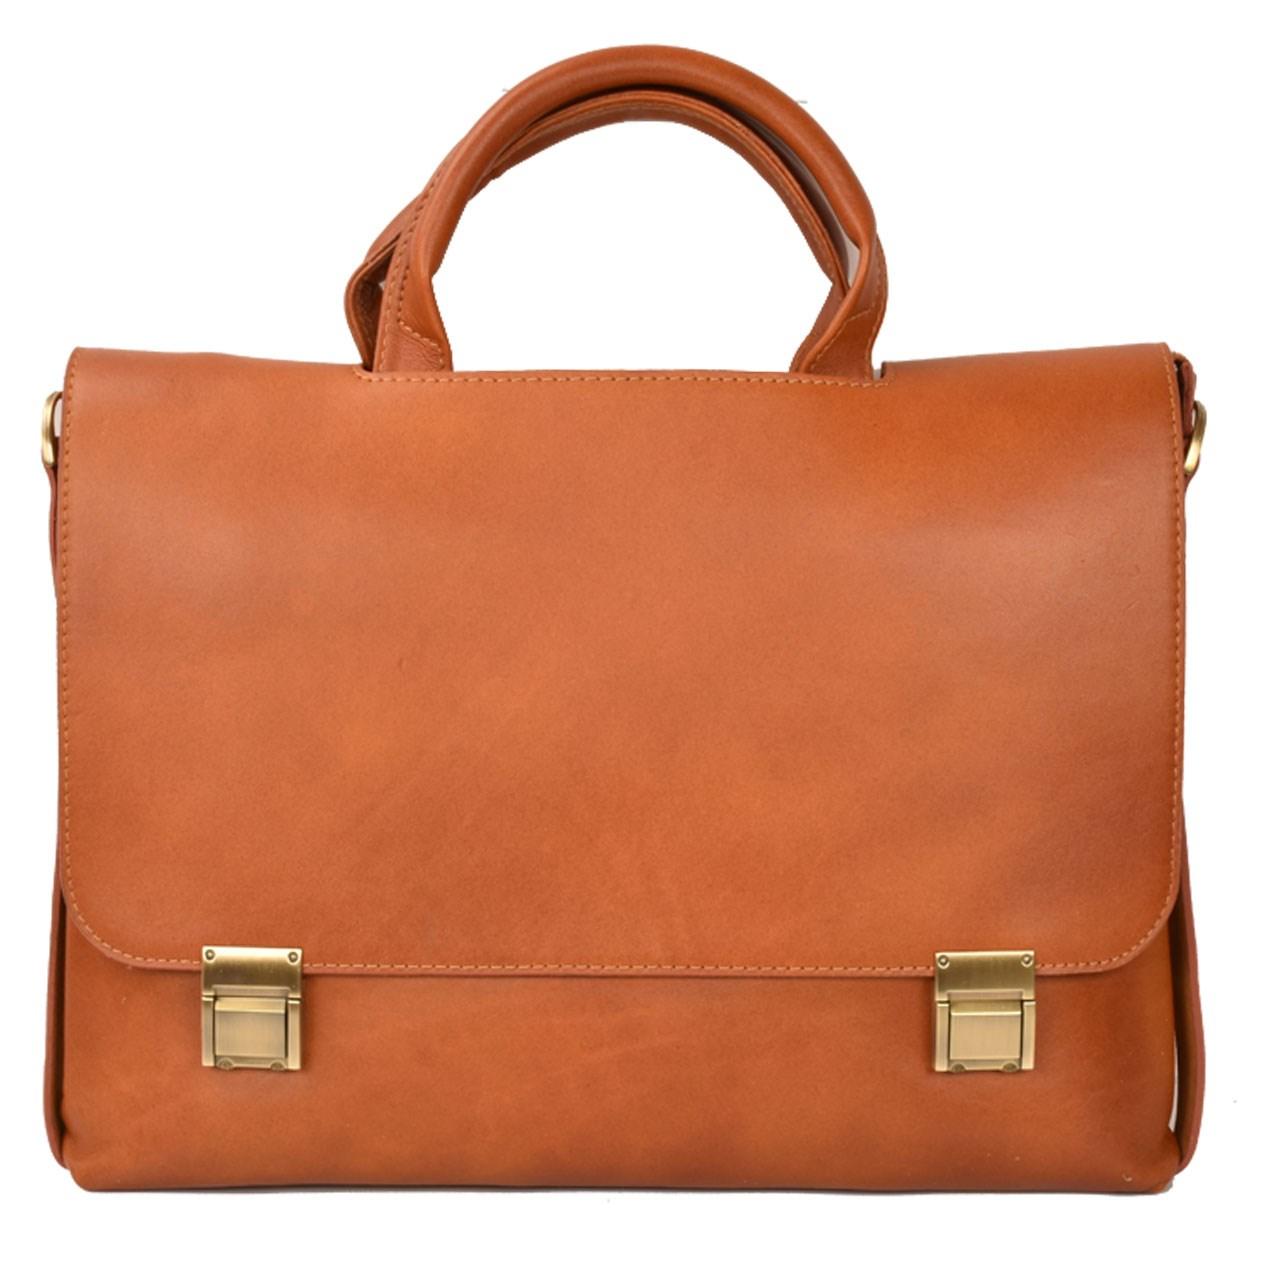 کیف اداری چرم طبیعی کهن چرم مدل L108-1